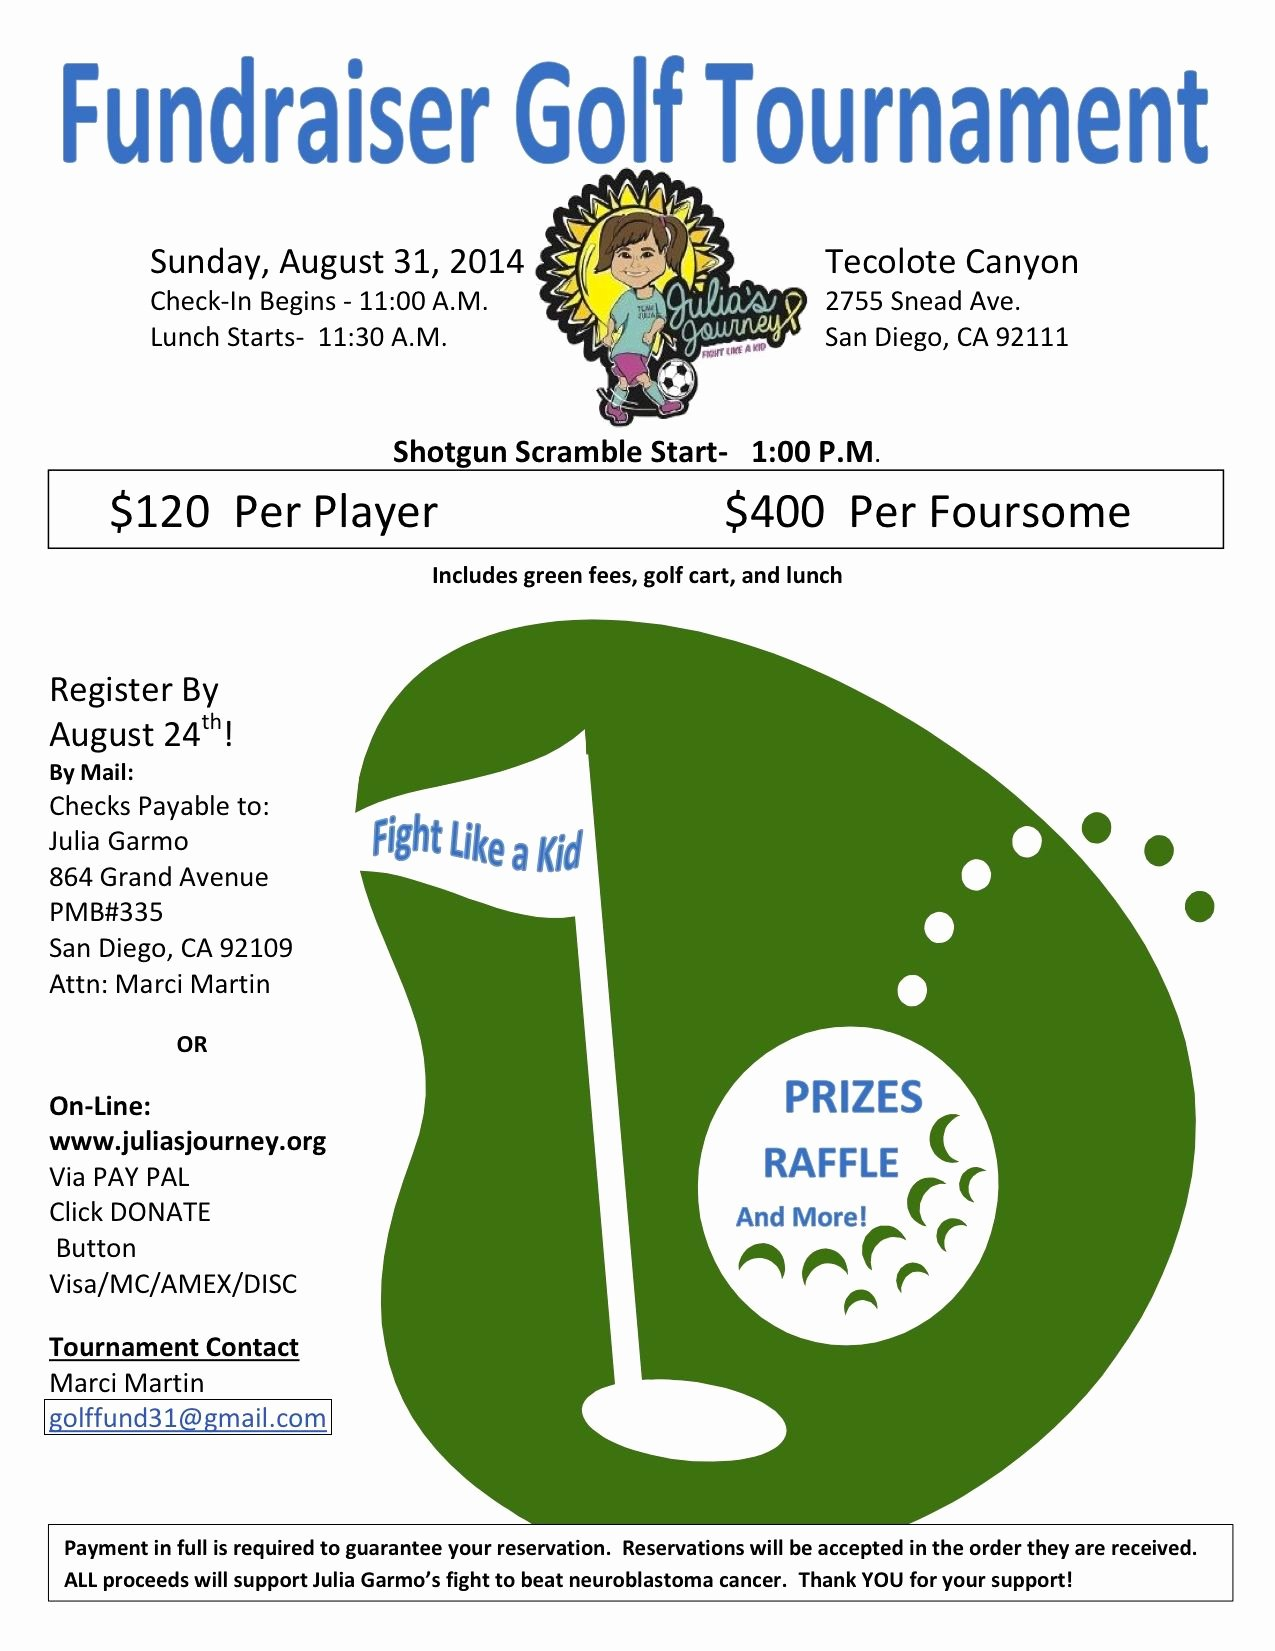 Golf tournament Flyer Template Luxury Julia S Journey Golf tournament Flyer 8 31 14 Golf Fundraiser Pinterest